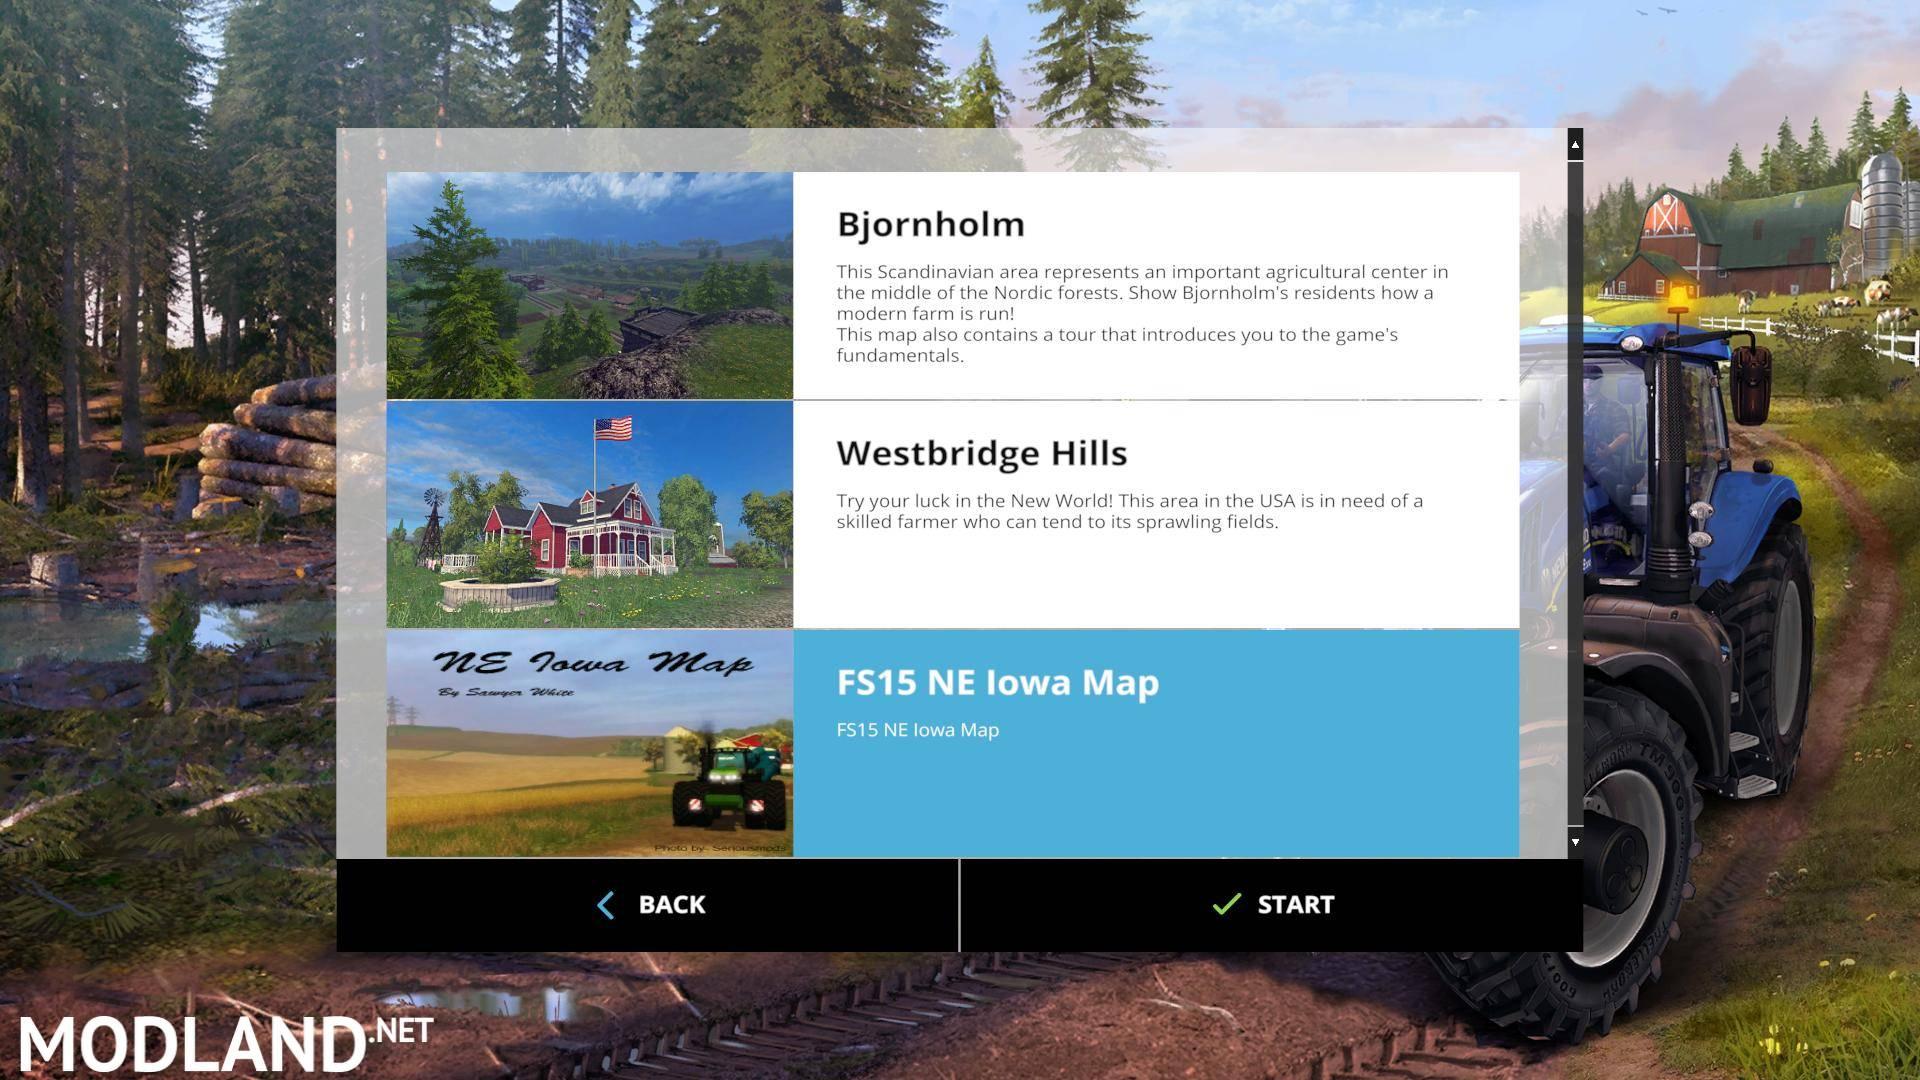 Ne Iowa Map 15 v 1 0 mod for Farming Simulator 2015 / 15 | FS, LS